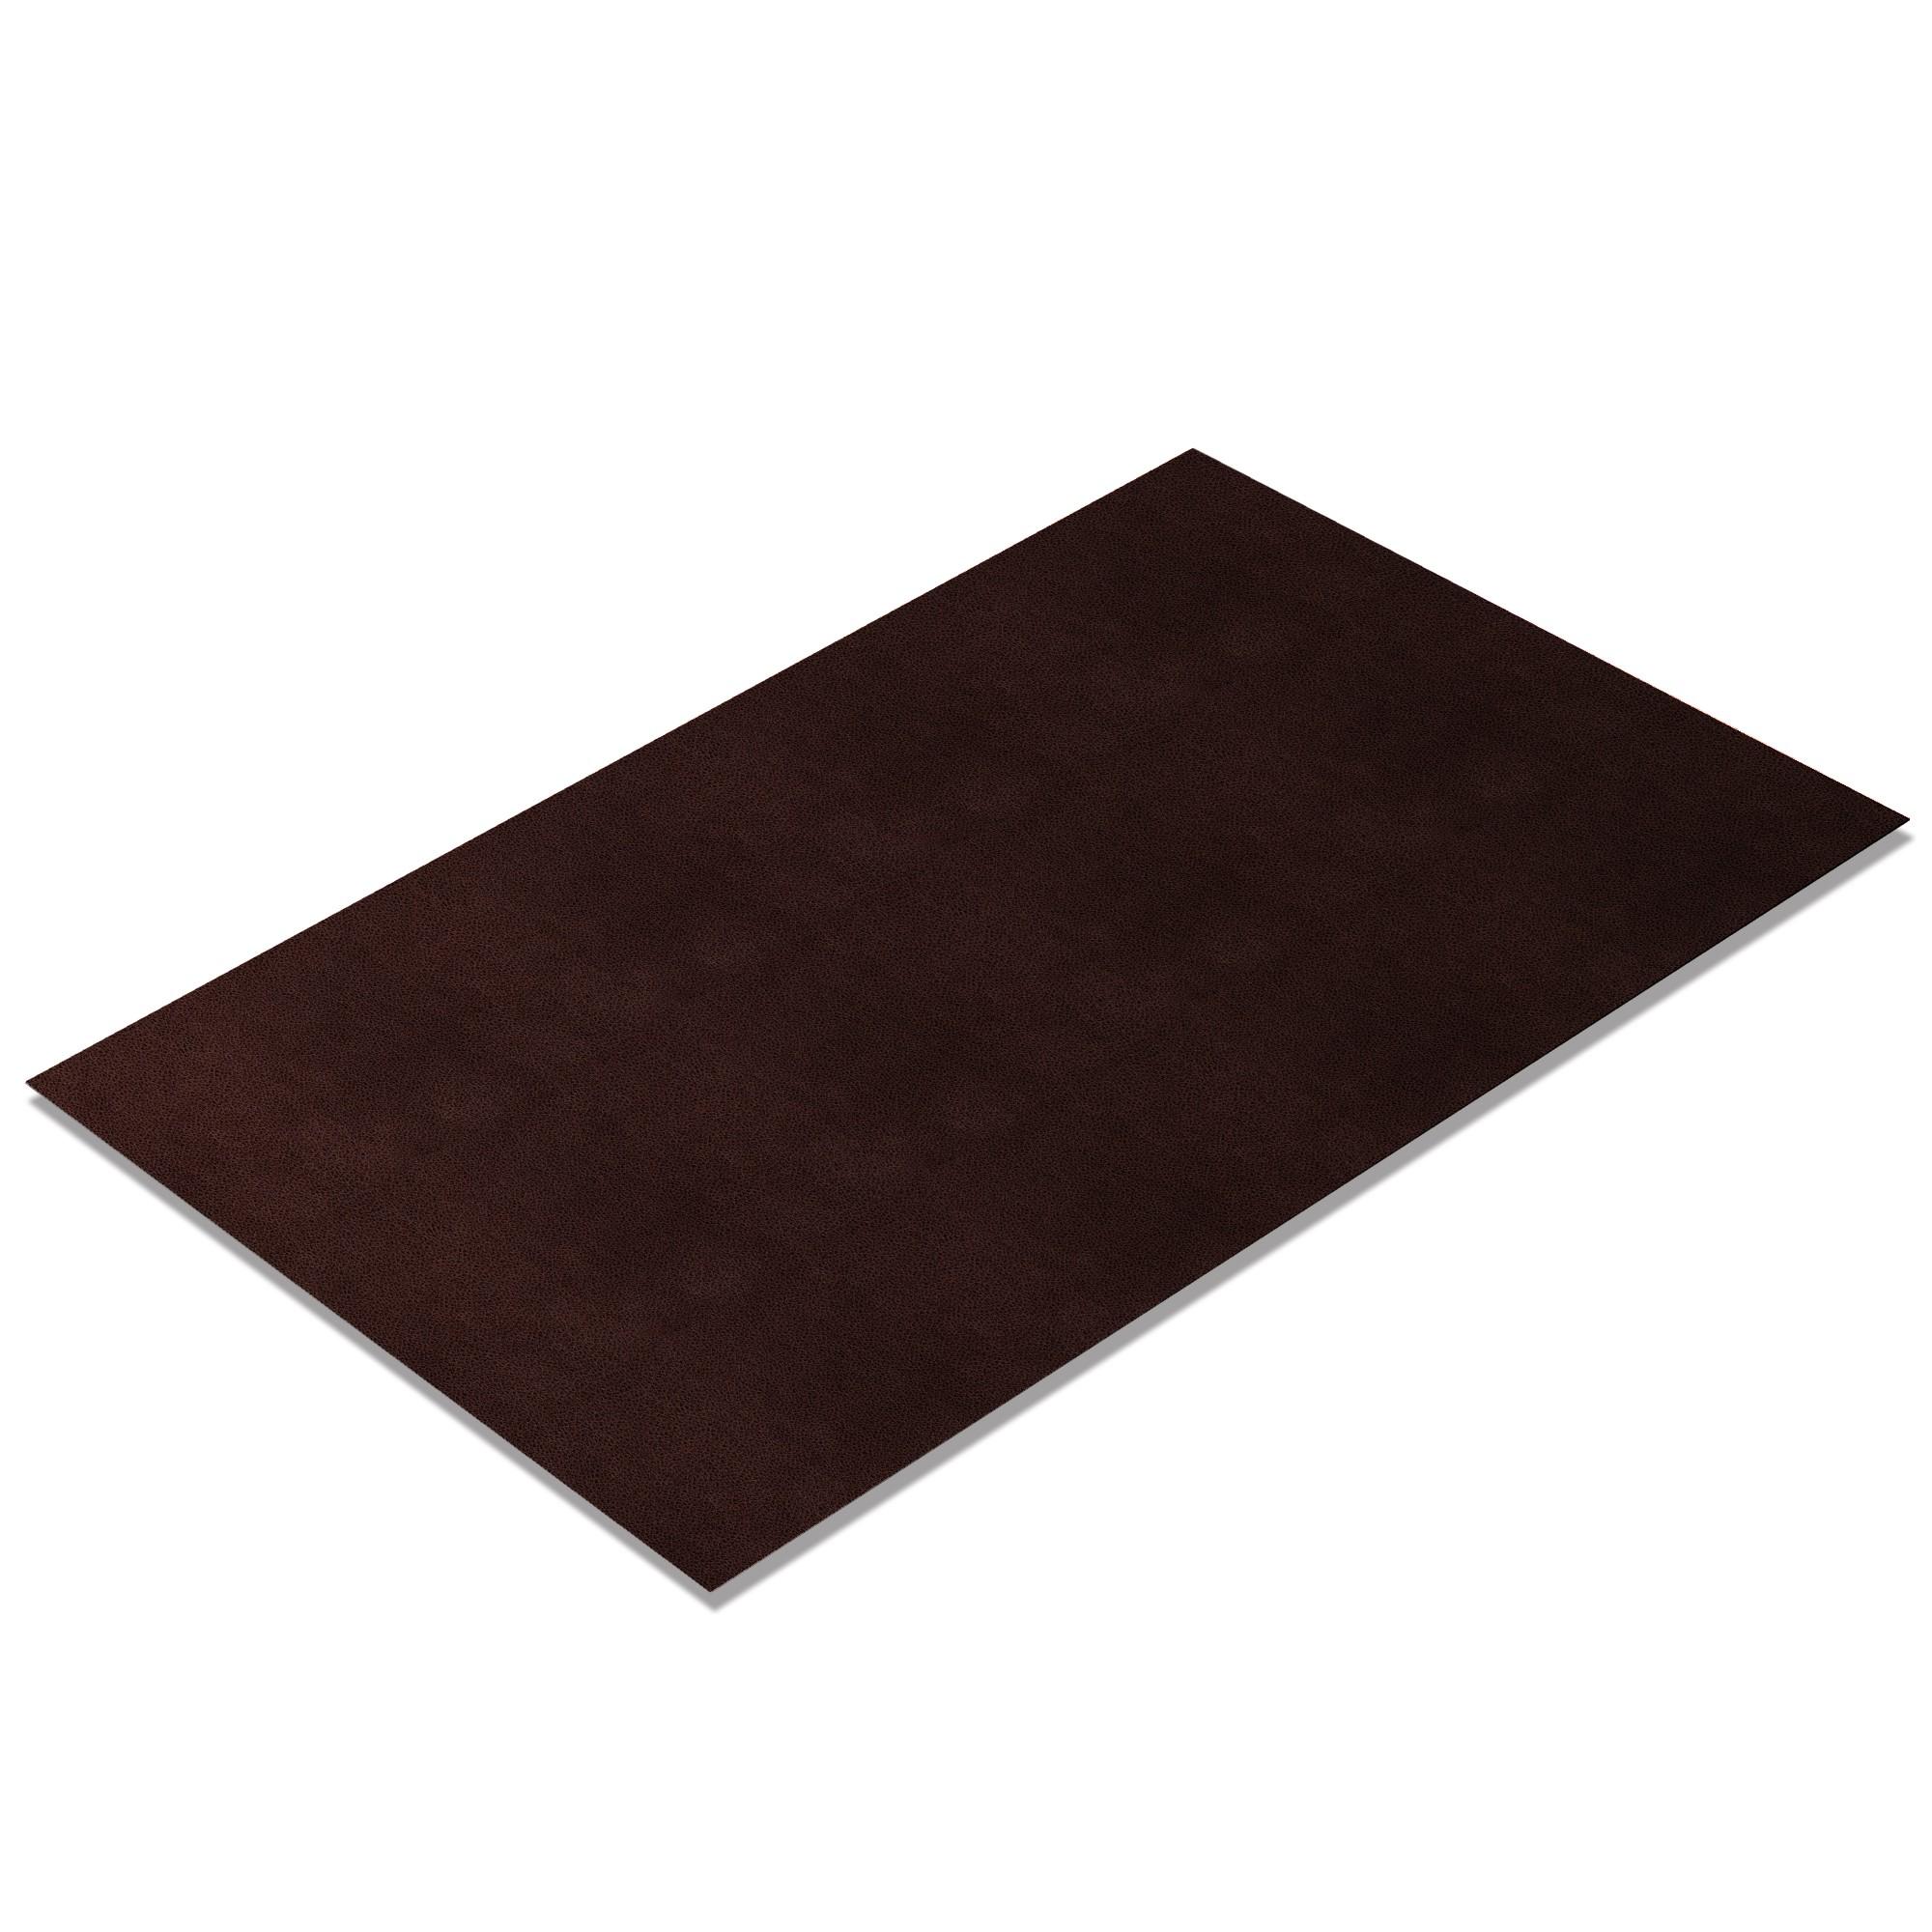 Kunstleder Meterware Nevada-Soft Dark-Chocolate [NEVSO811]